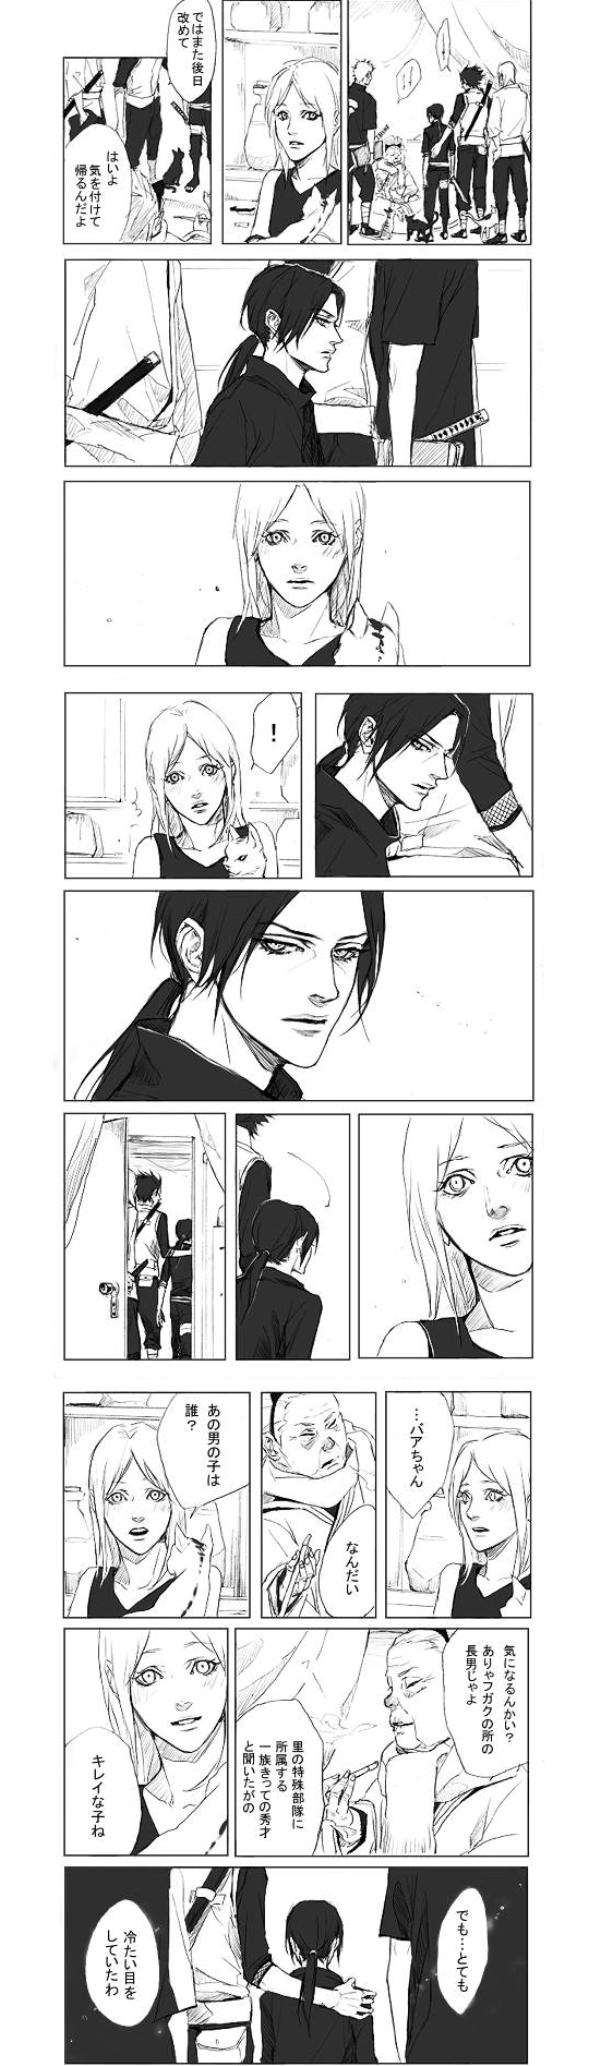 Tags: Anime, Lili Art, NARUTO, Uchiha Itachi, Nekobaa, Translation Request, Akatsuki (NARUTO)